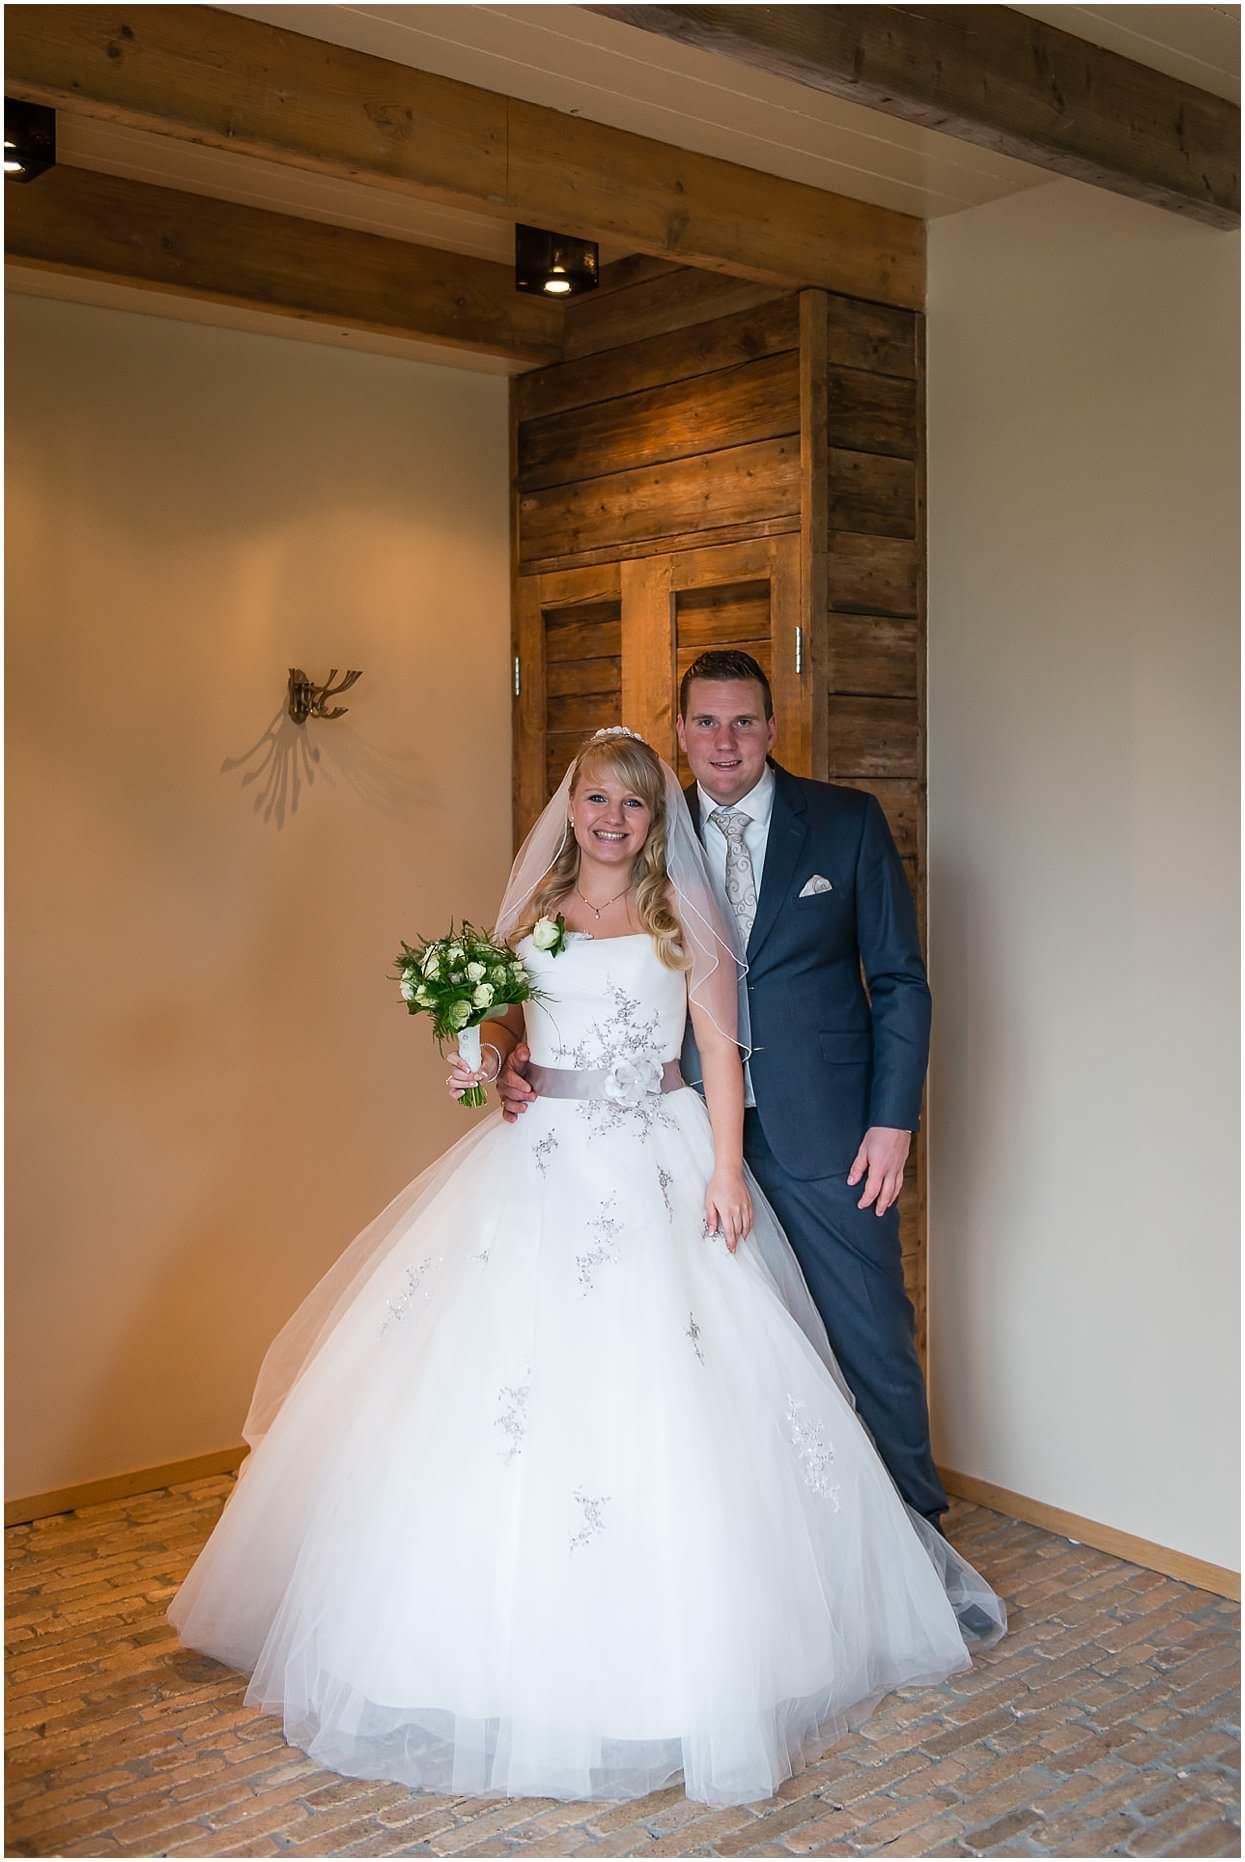 Bruidsfotograaf, Cuijk,Mill, Dennis & Cardisha, Sandy Peters, trouwfotograaf, Onze lieve vrouwe kapel st Agatha 0013.jpg